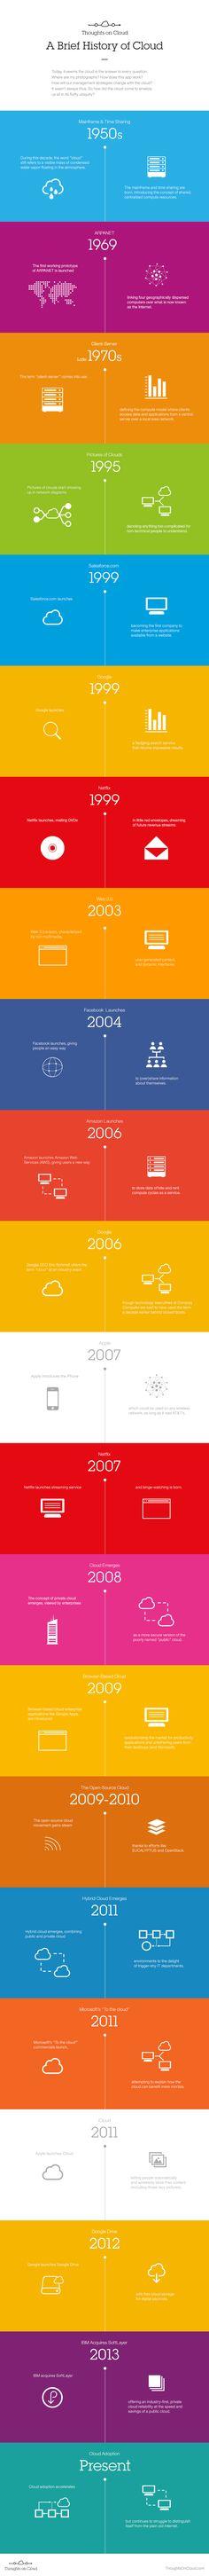 Vom Großrechner 1950 über Amazon bis iCloud: Die Geschichte des Cloud Computing | Kroker's Look @ IT